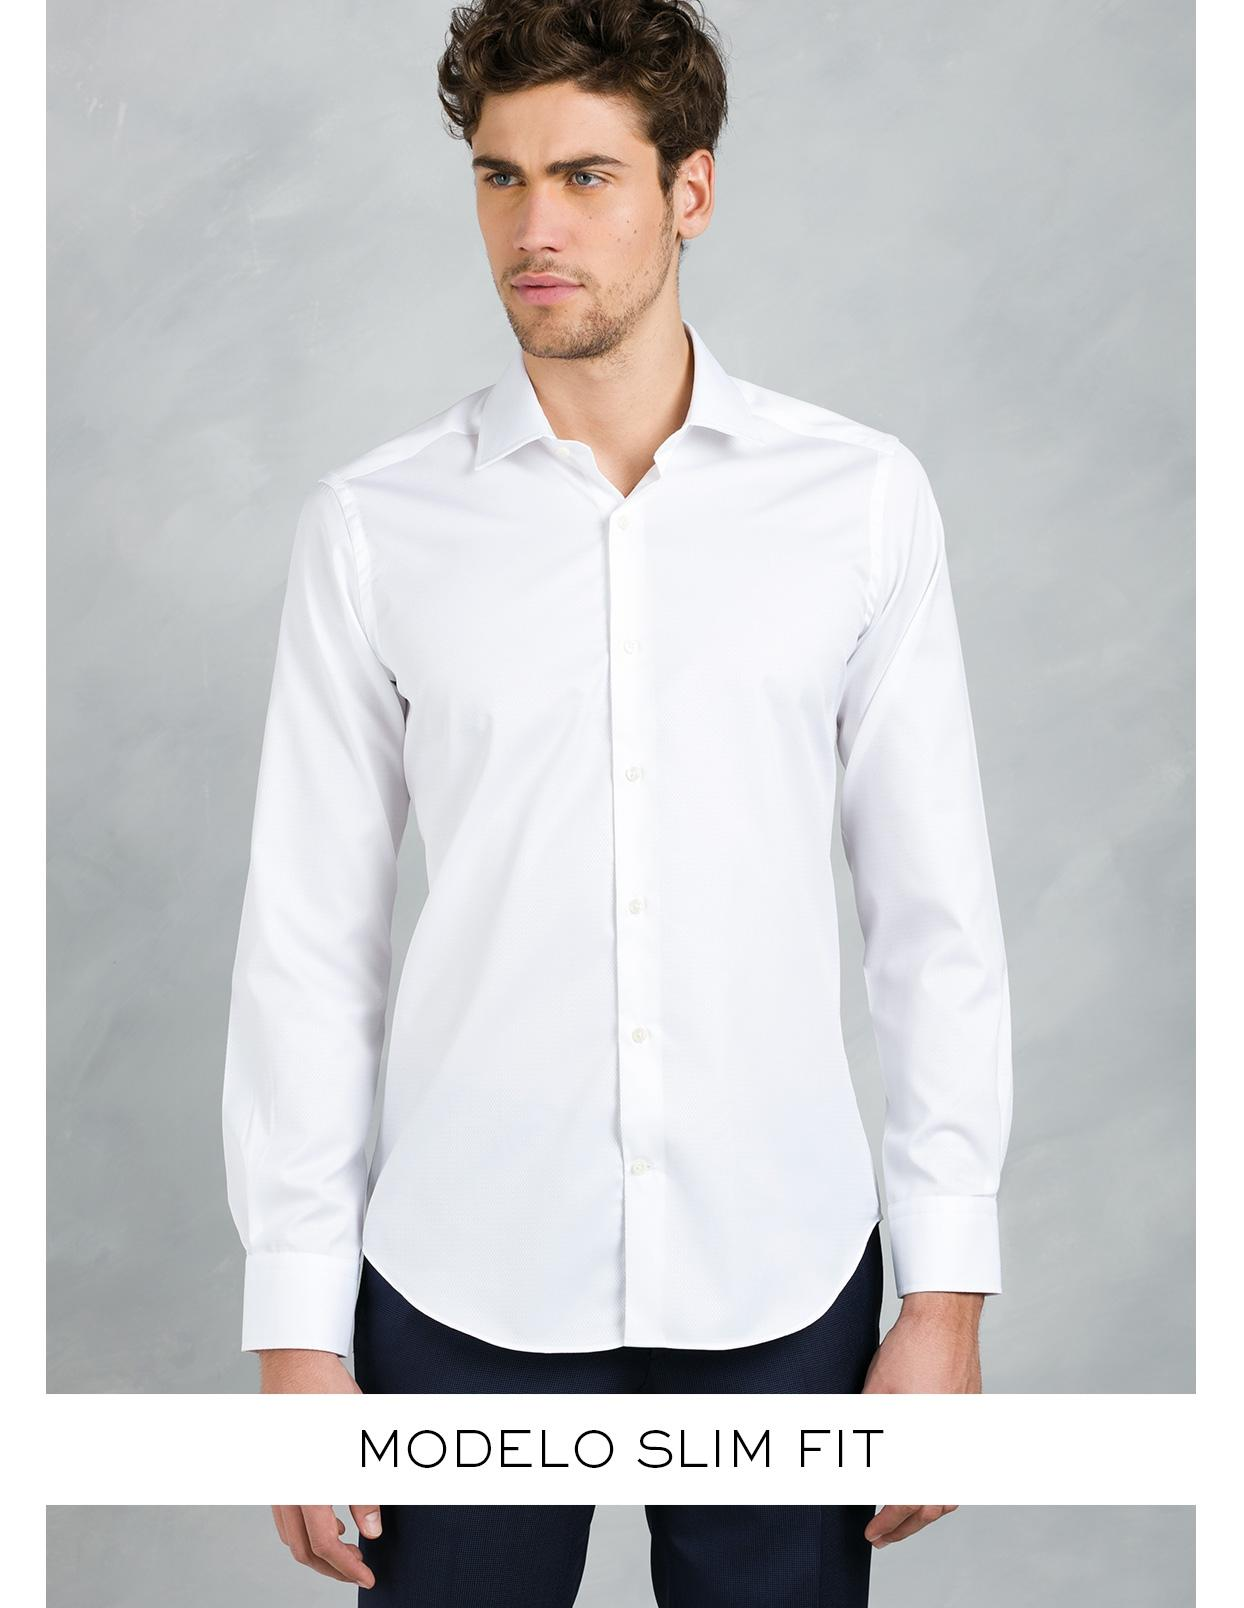 Camisa Formal Wear SLIM FIT cuello italiano modelo ROMA microtextura color celeste, 100% Algodón. - Ítem3